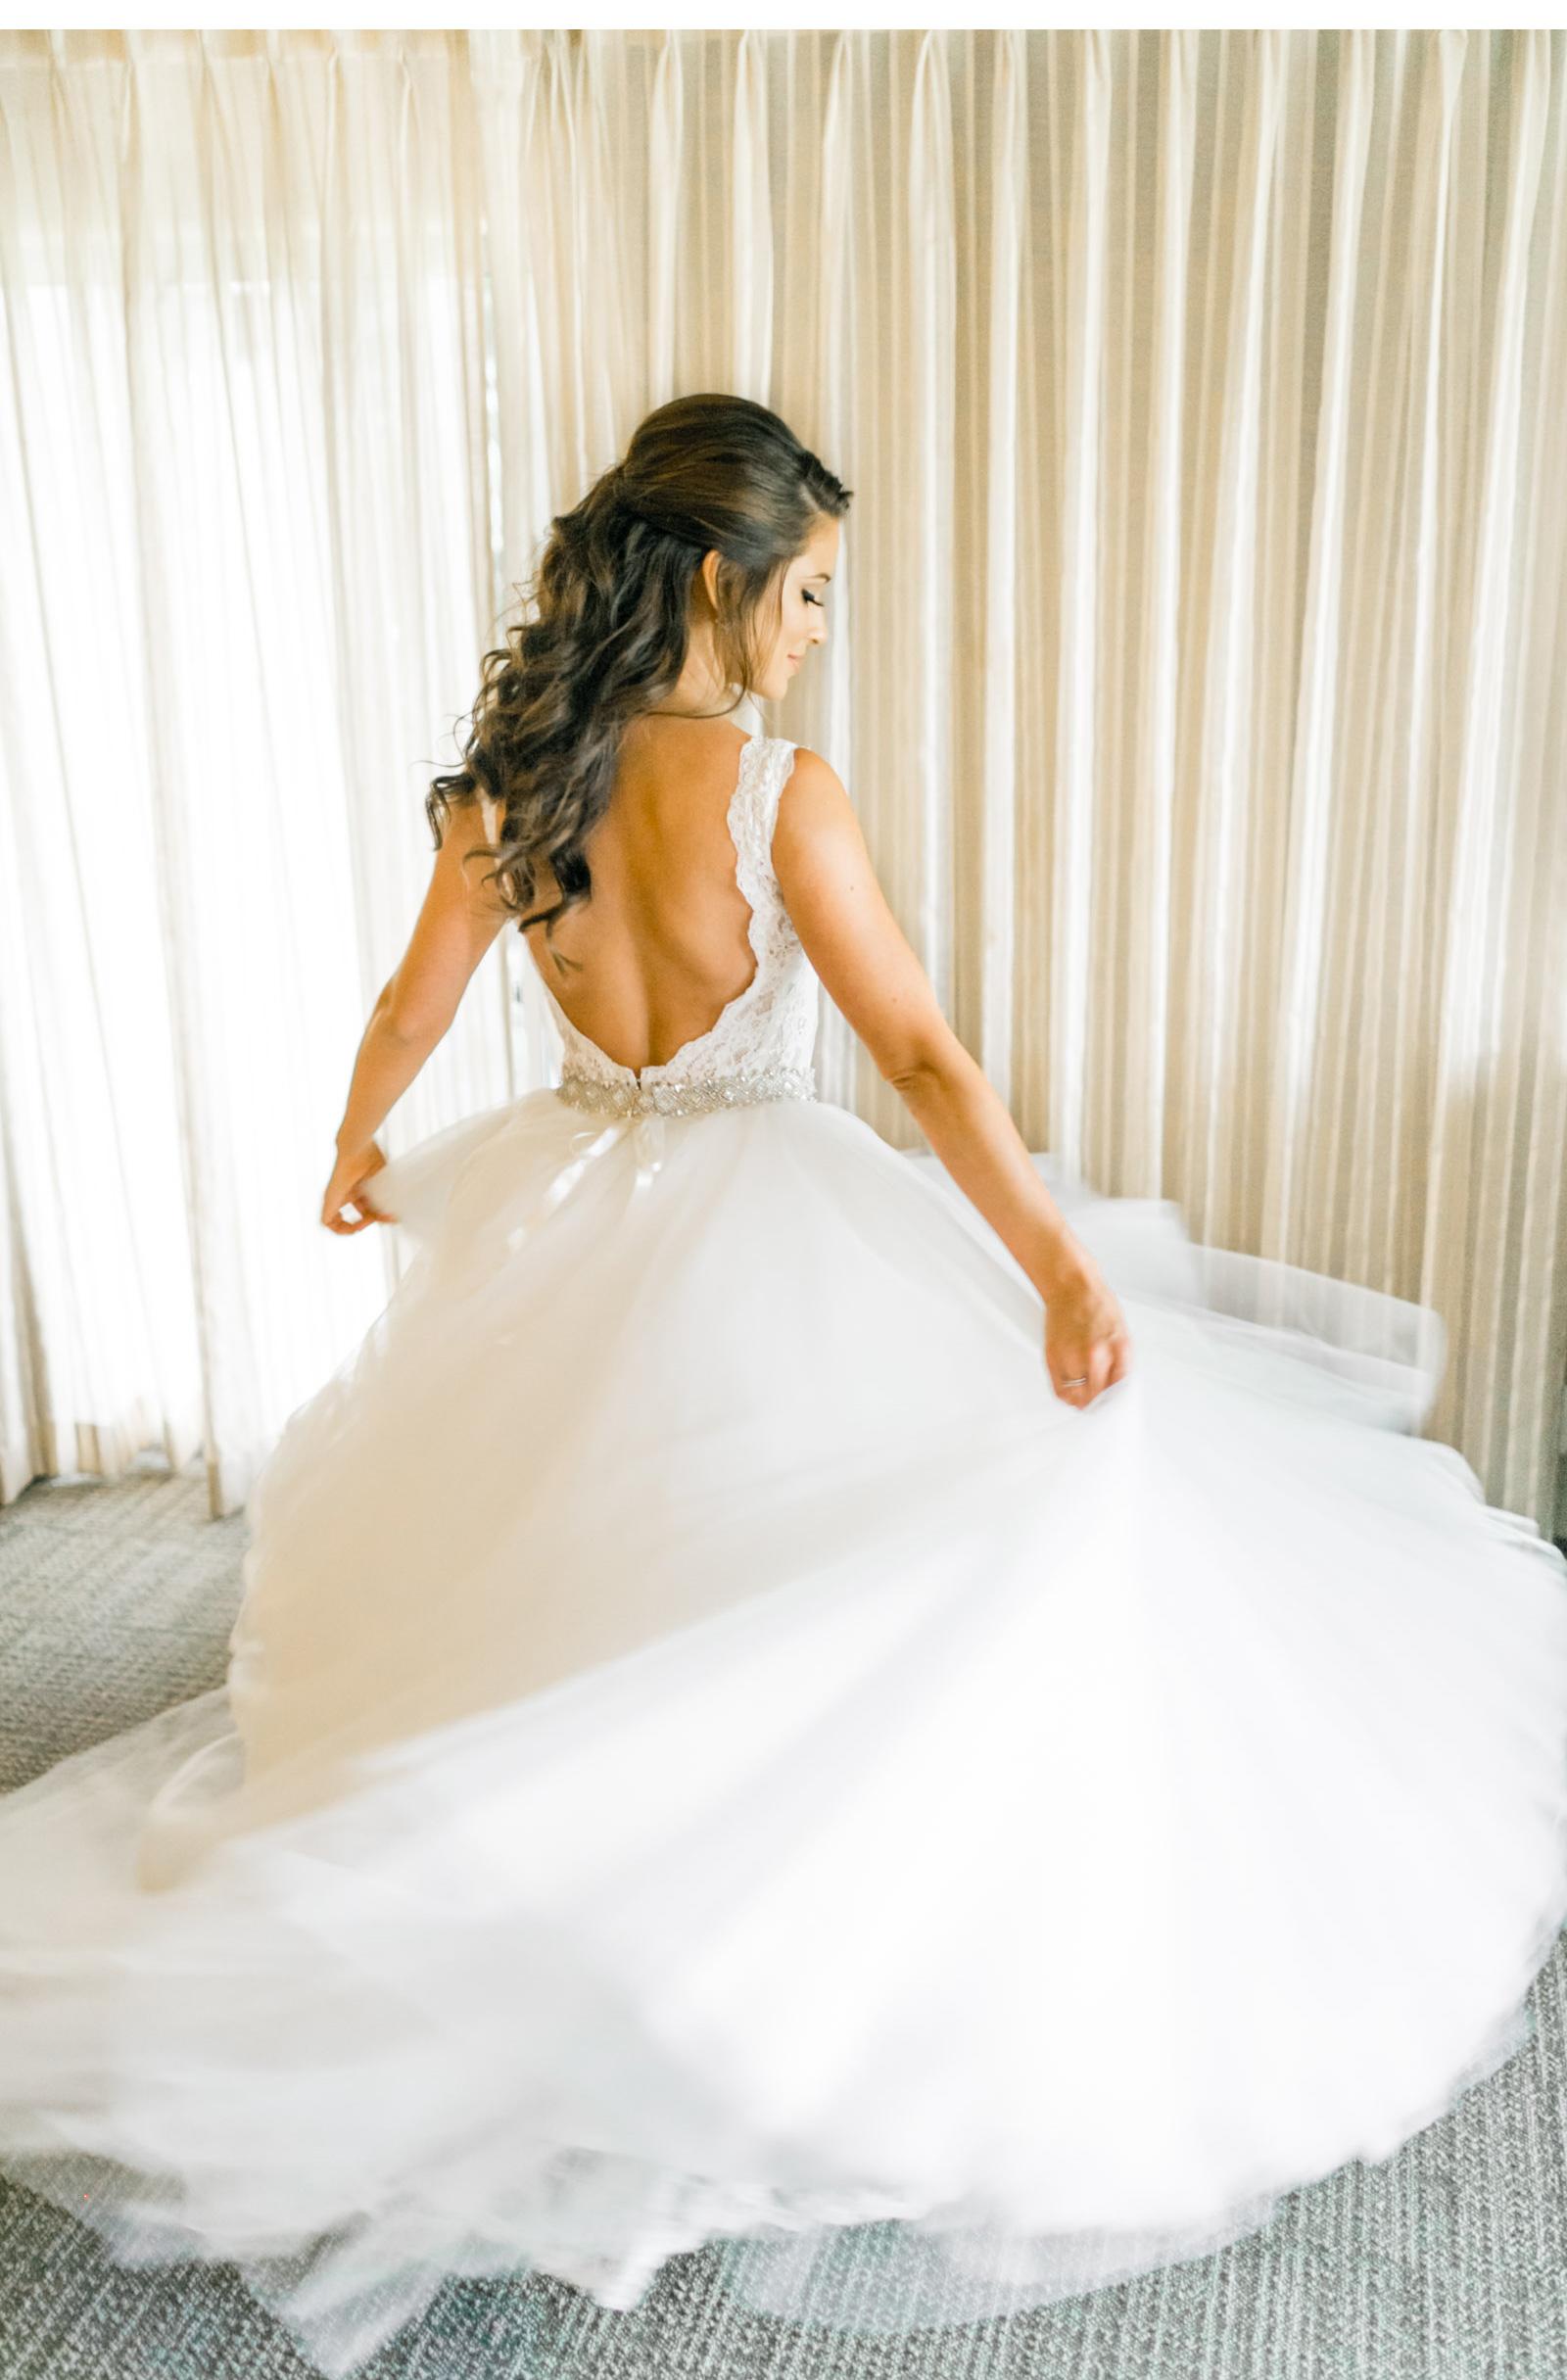 Nia-Sanchez-Wedding-Miss-USA-Natalie-Schutt-Photography_03.jpg